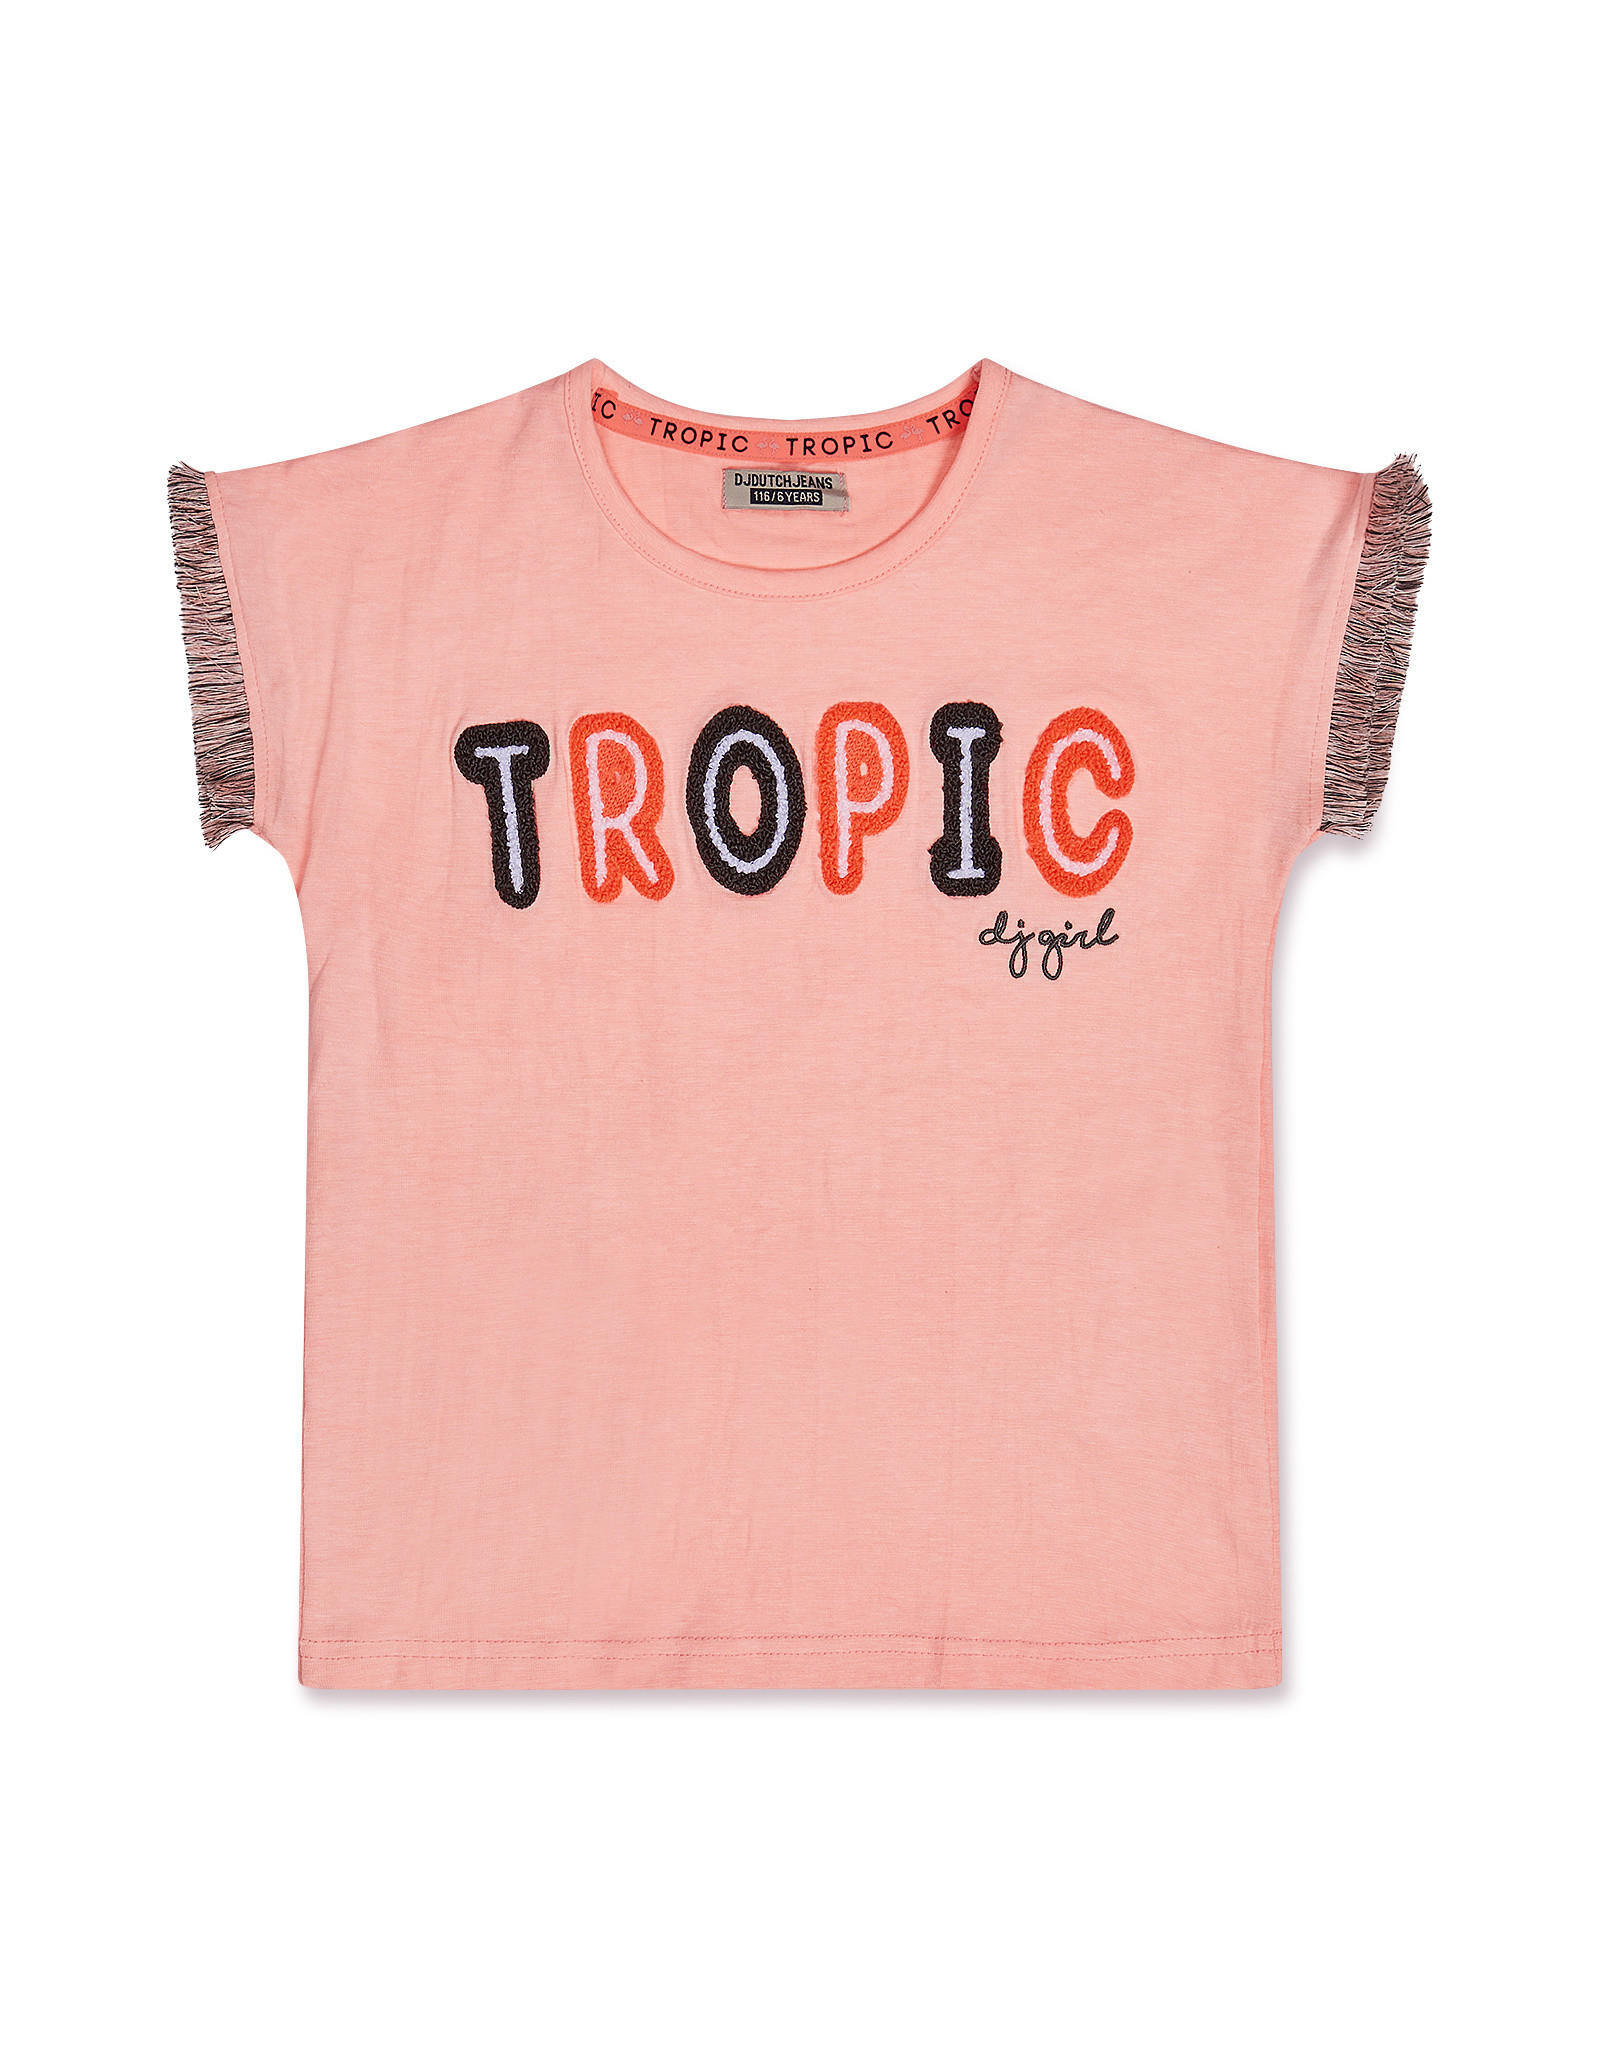 Dutch Jeans T-shirt ss, Light neon coral